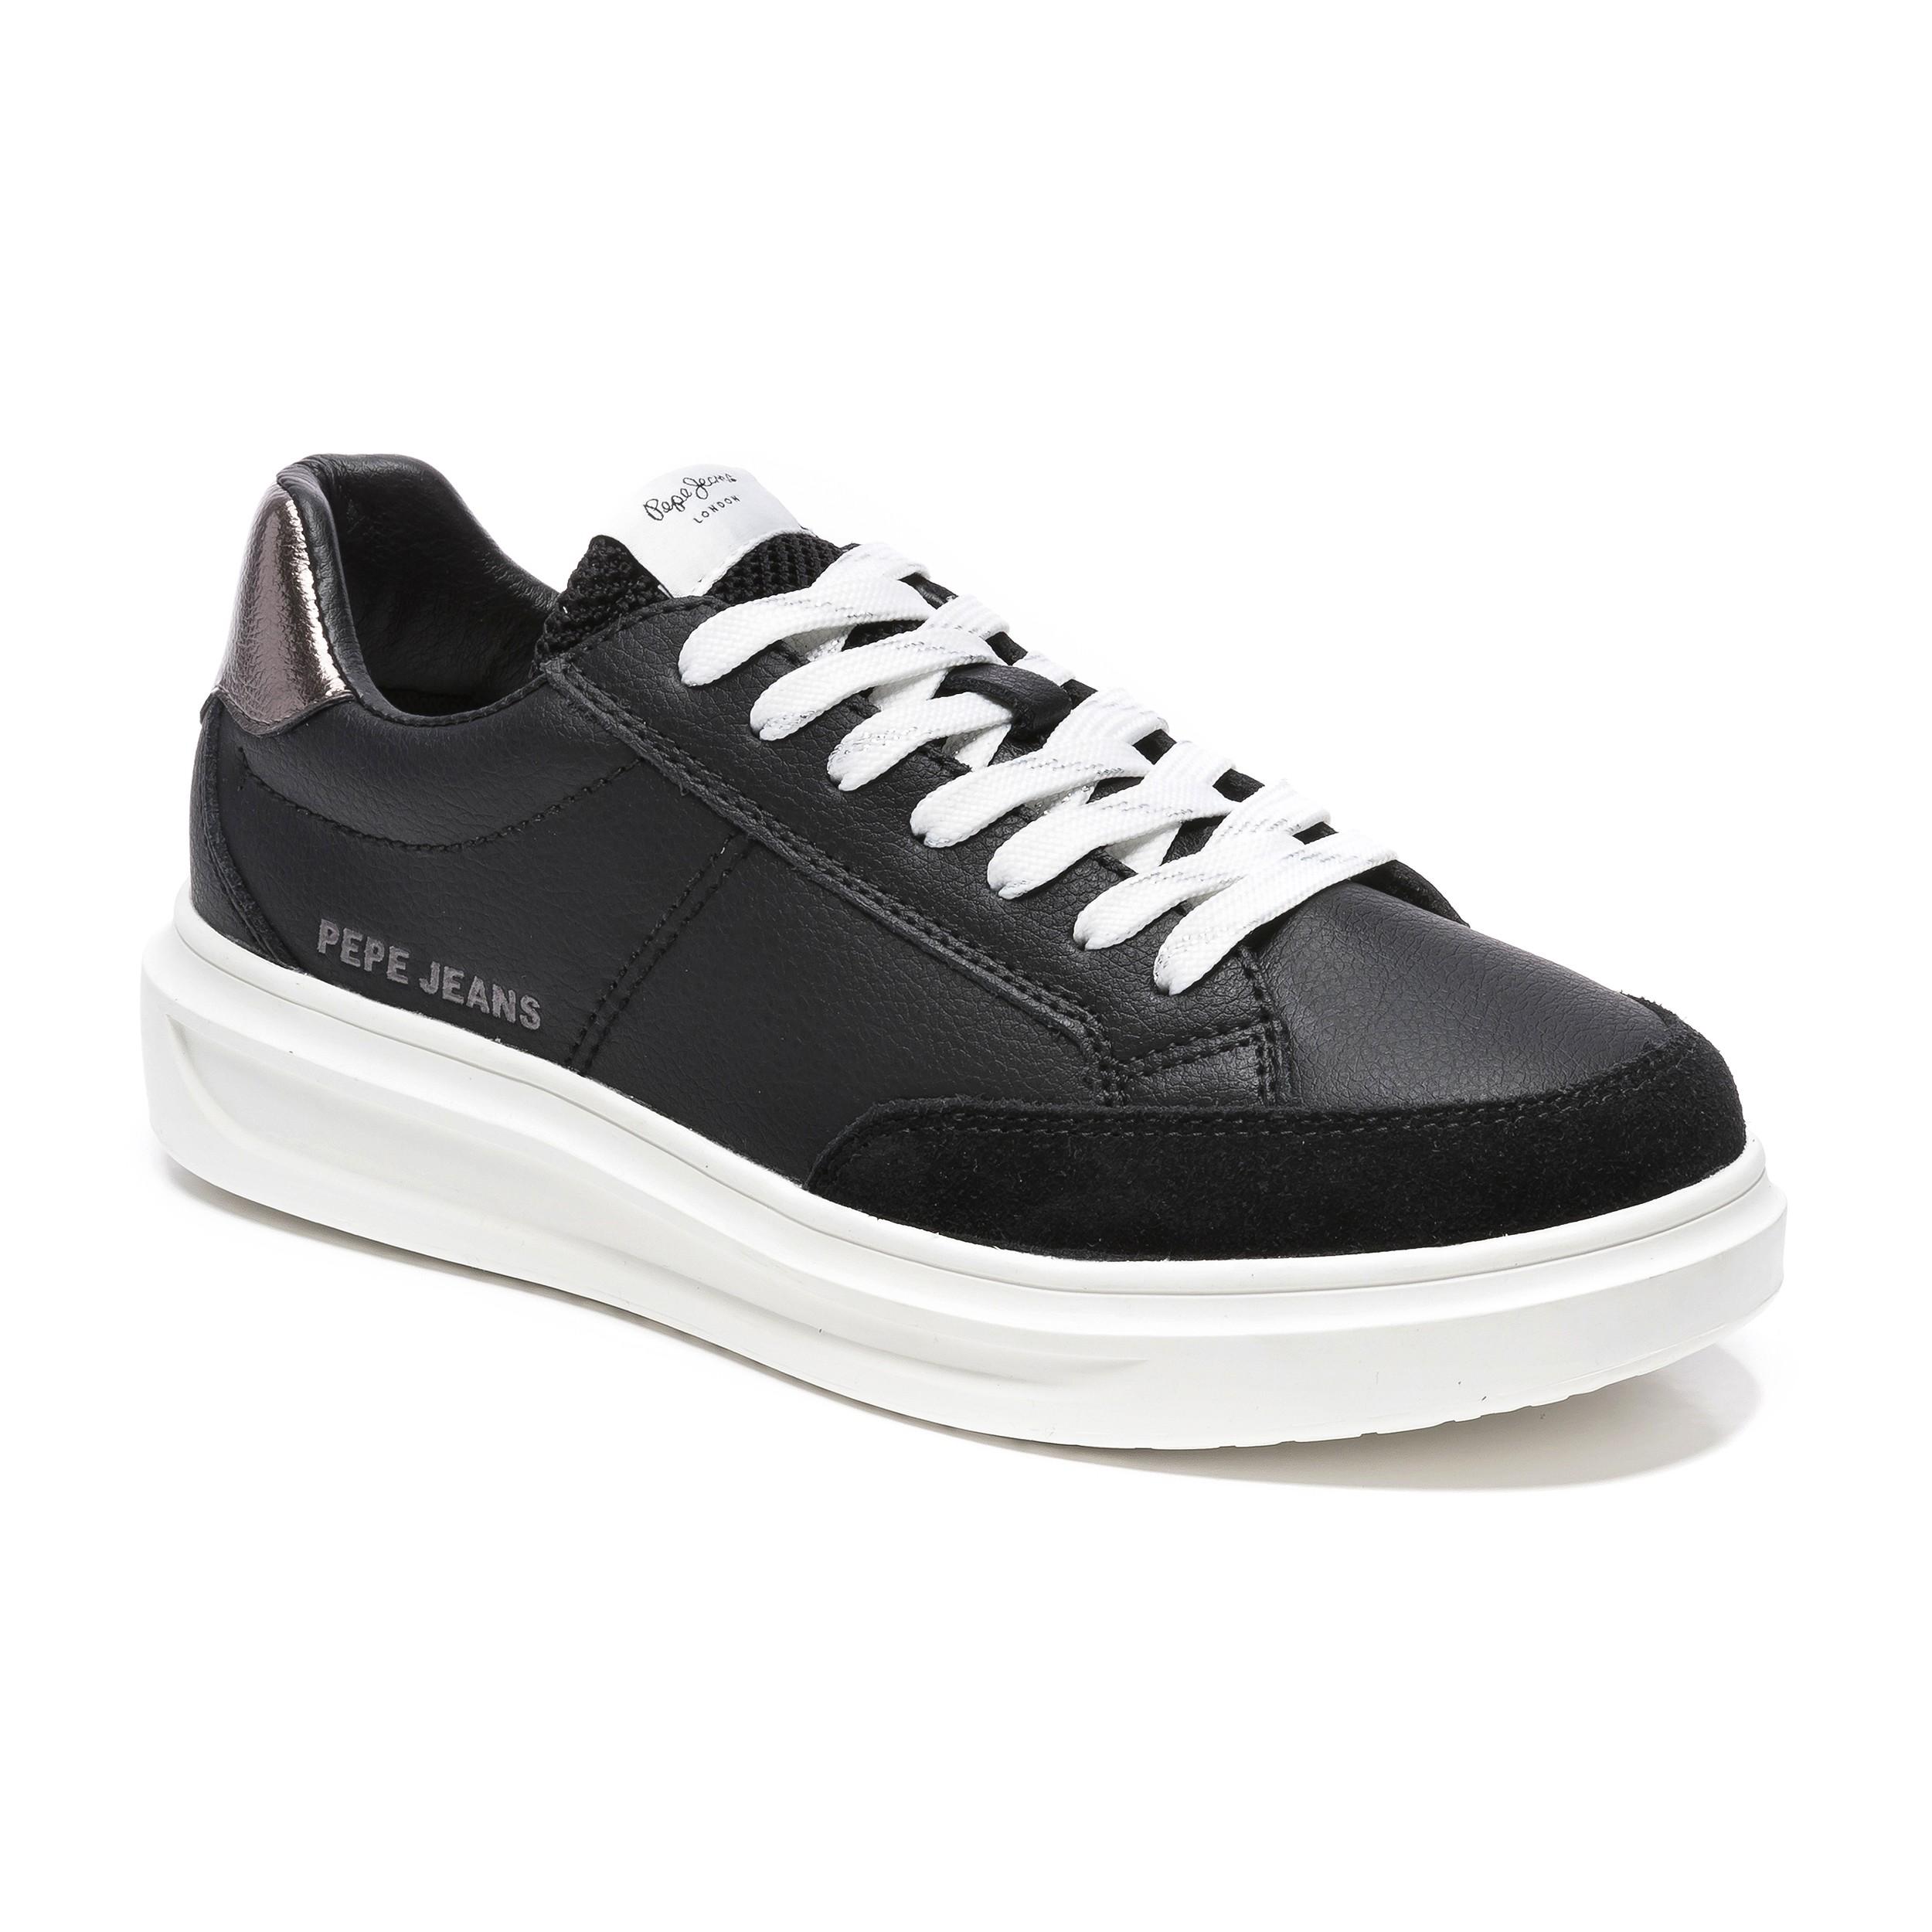 Pepe jeans ABBEY Sneakers Γυναικεία Παπούτσια PLS31052-999 Mαύρο